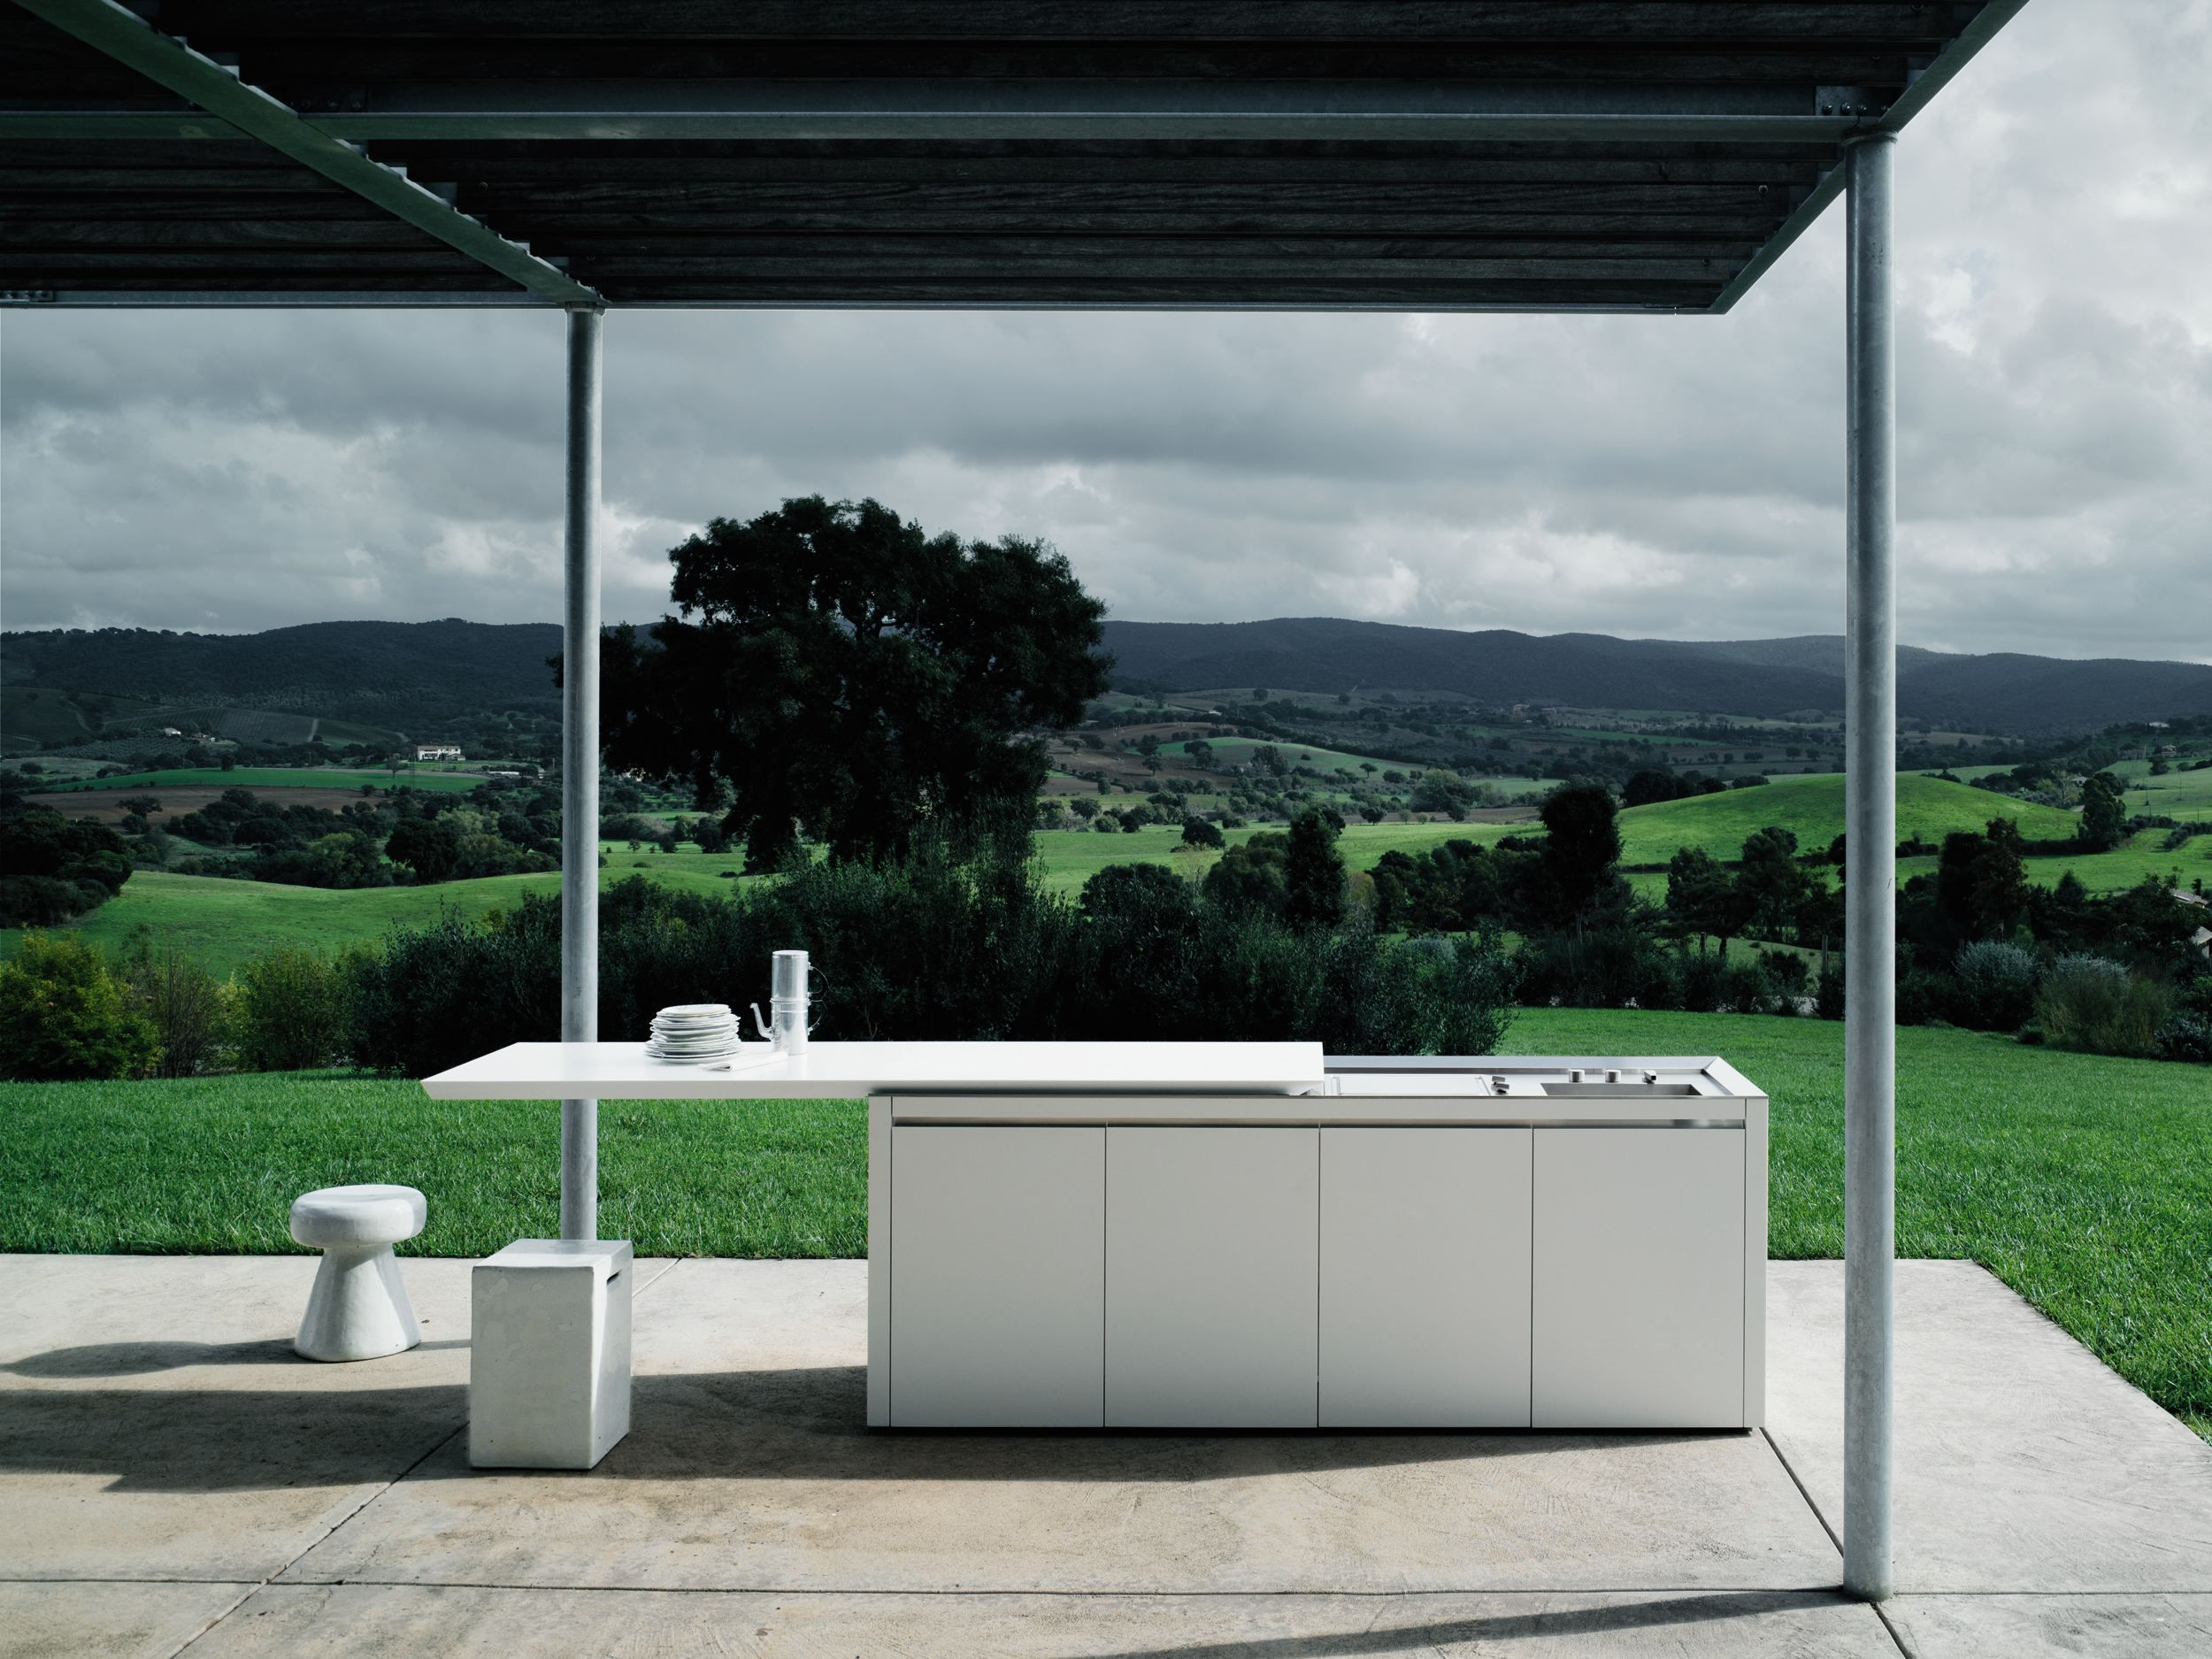 Küchendesign im freien corian outdoor kitchen k outdoor by boffi  design norbert wangen